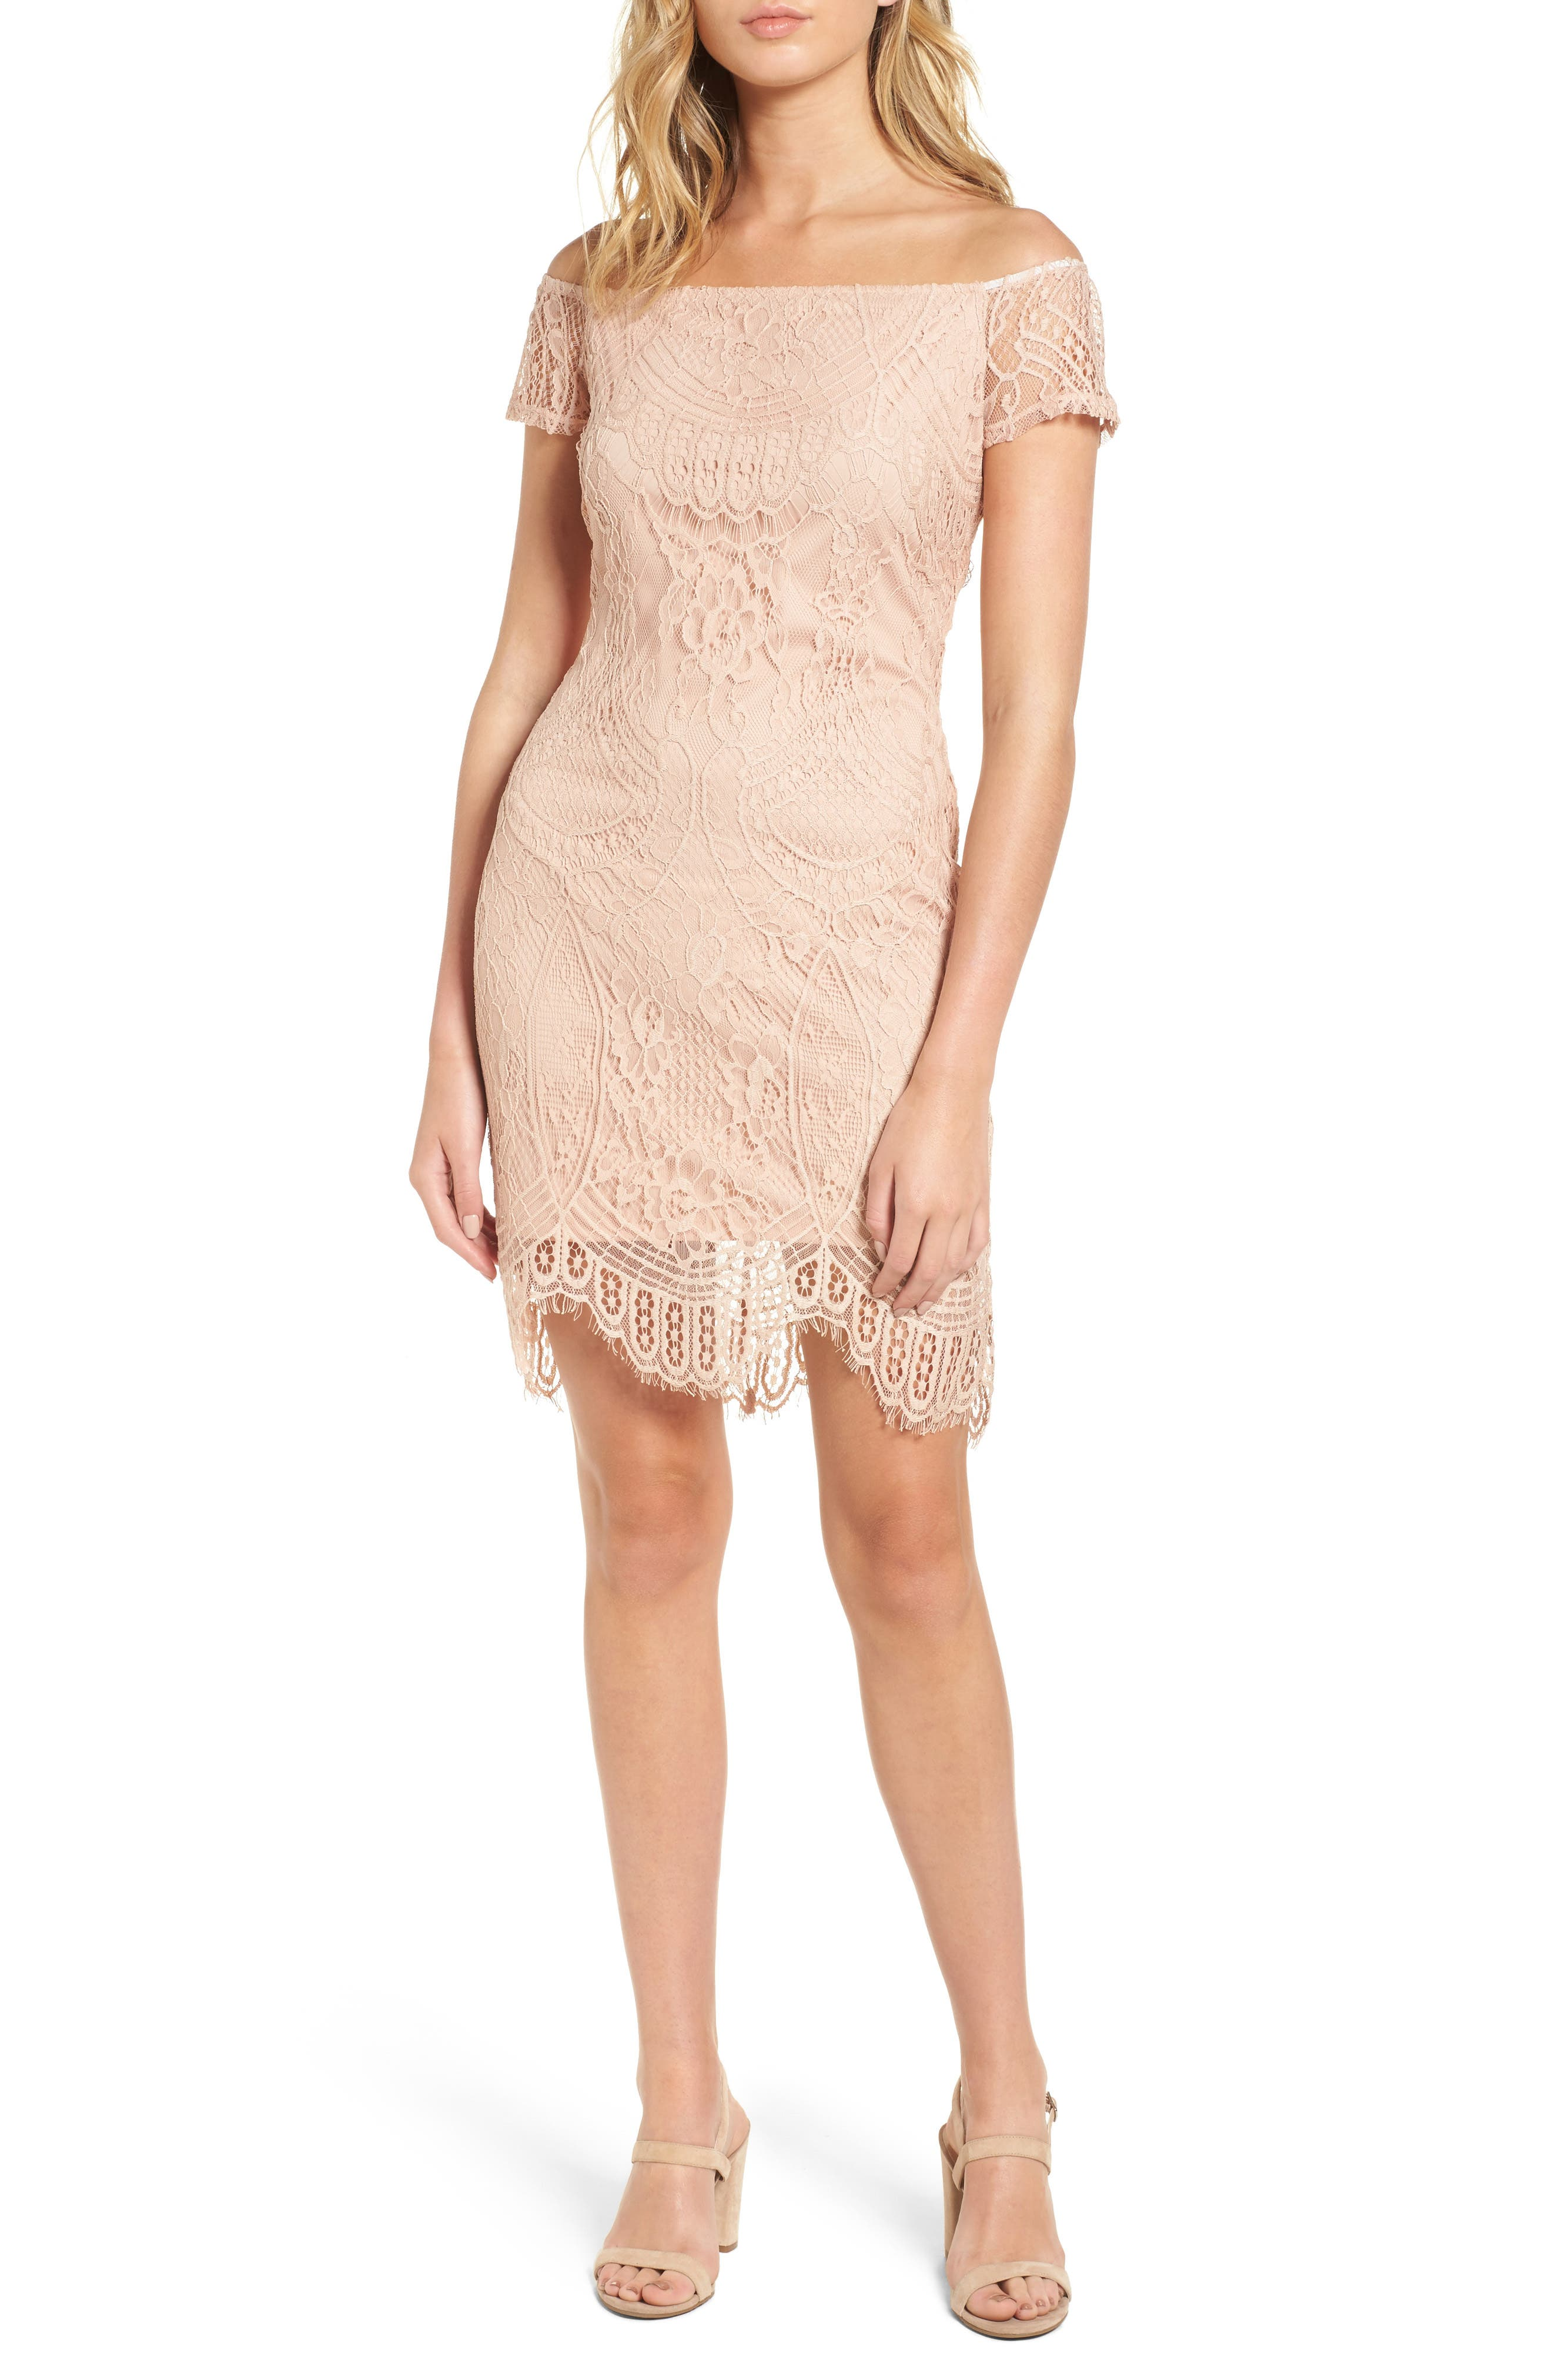 LOVE, FIRE Lace Off the Shoulder Dress